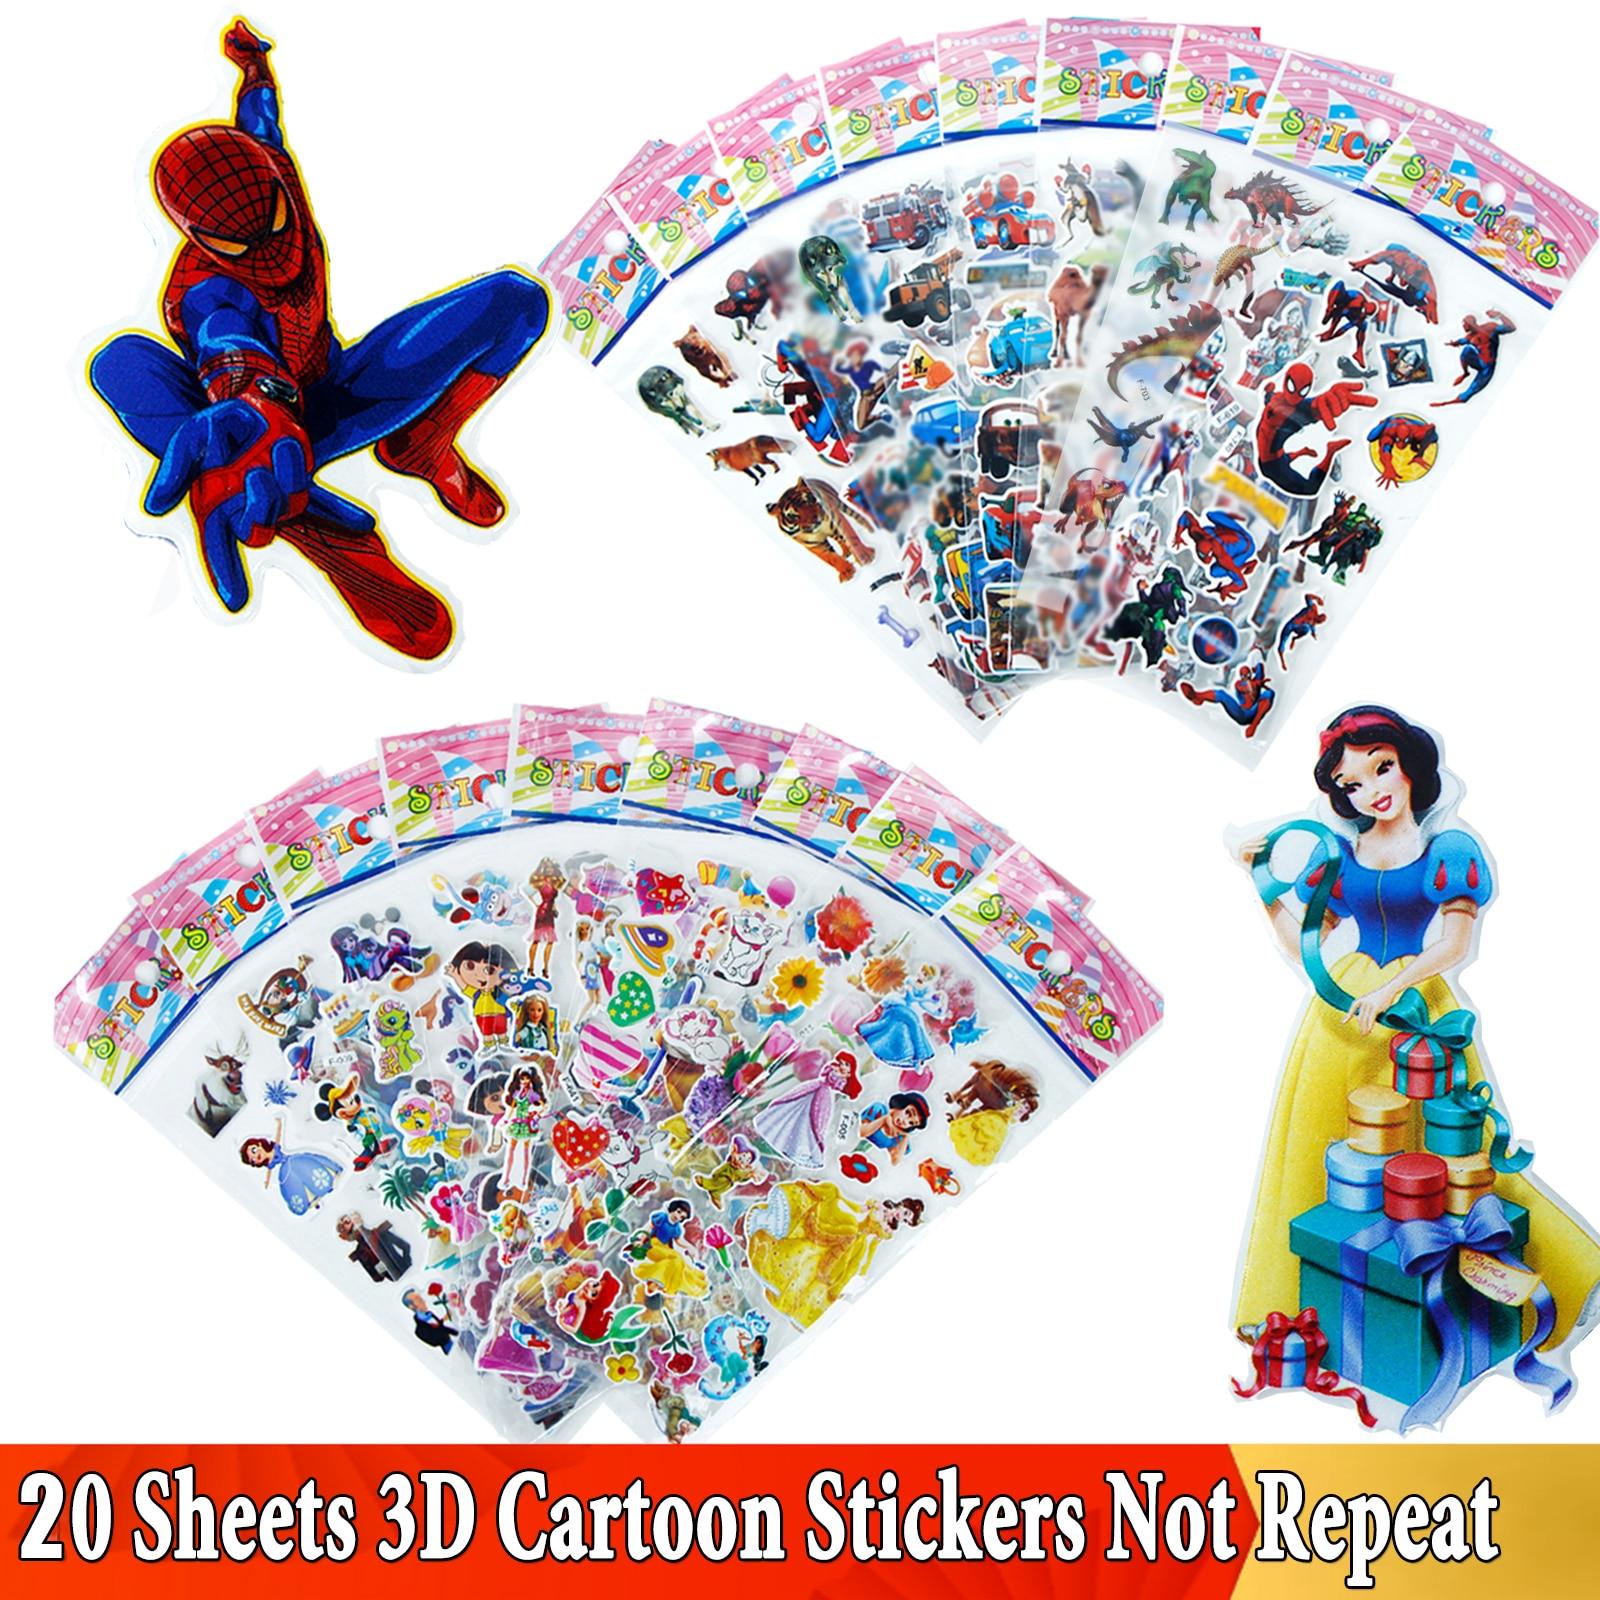 20 Different Sheets 3D Puffy Bulk Stickers For Girl Boy Princess Birthday Gift Scrapbooking Teachers Animals Cartoon Sticker